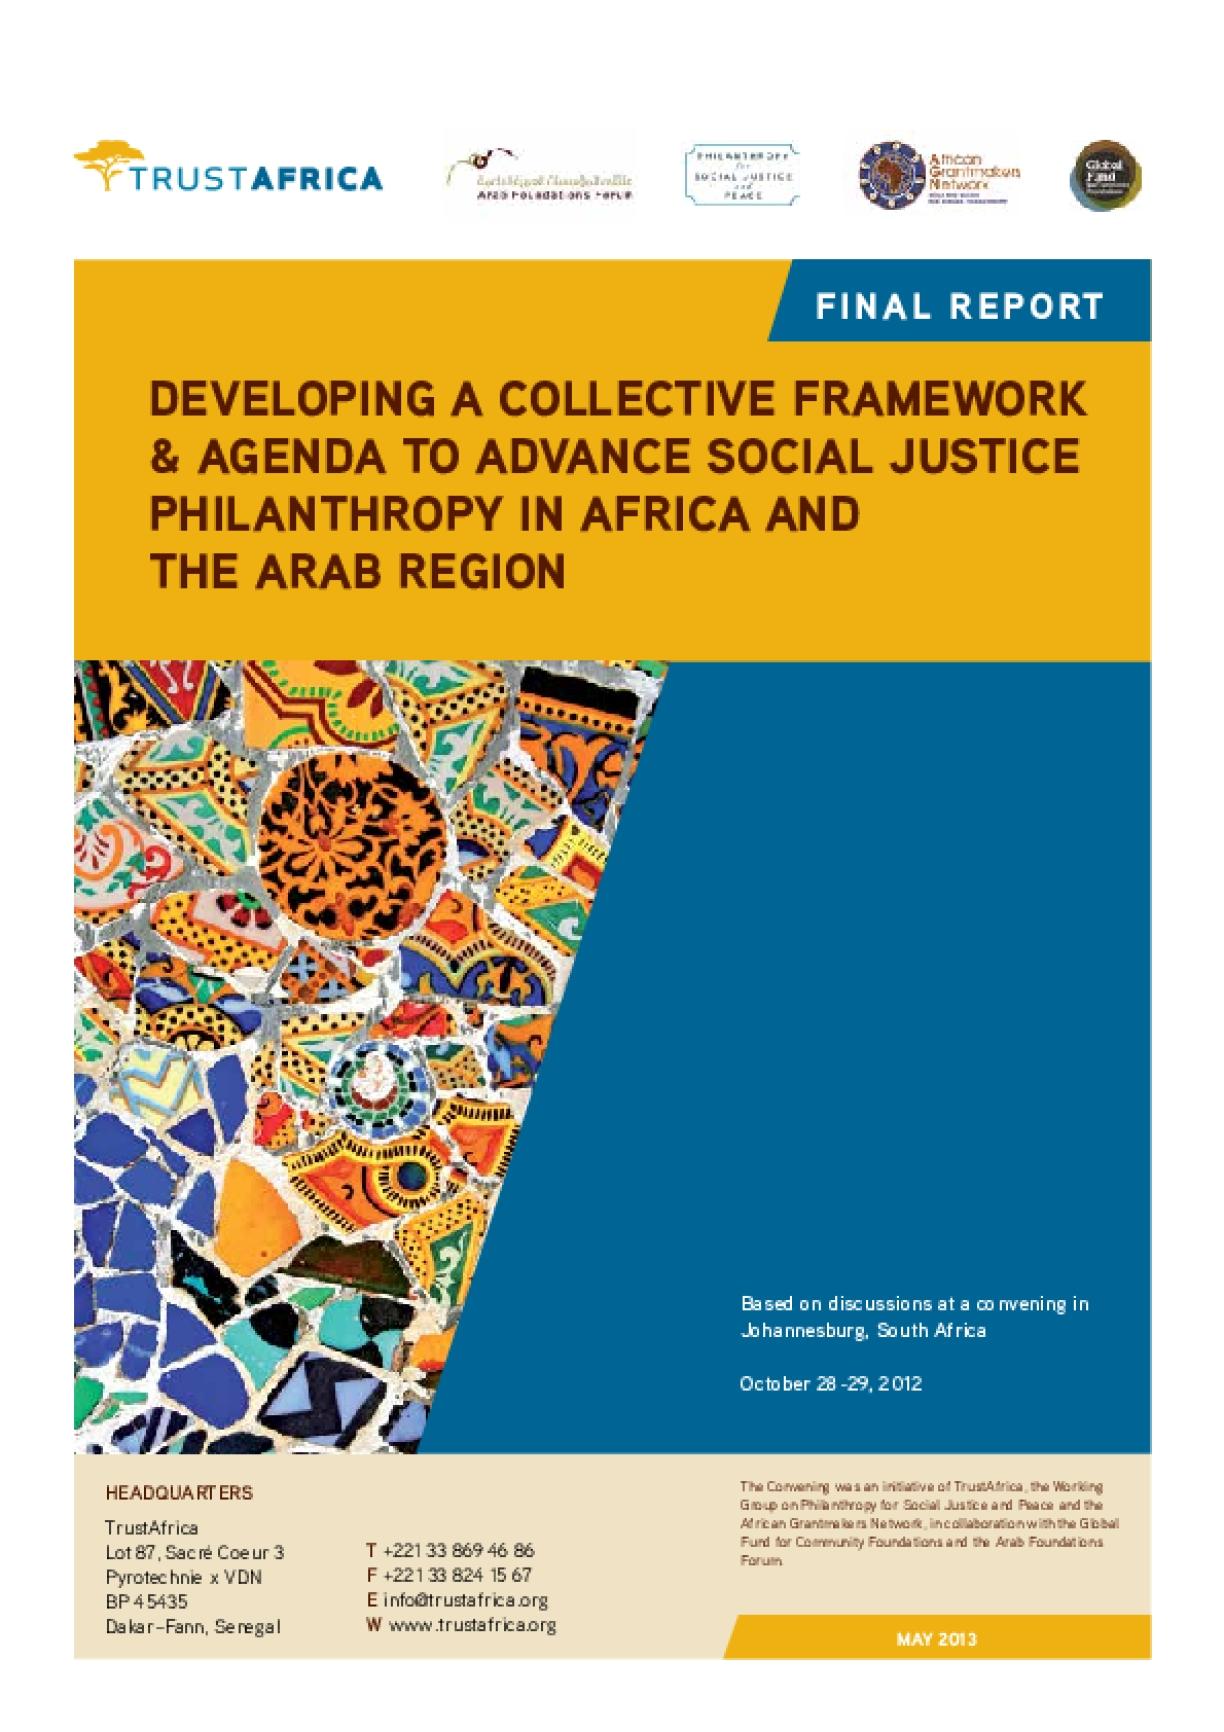 African Social Justice Philanthropy